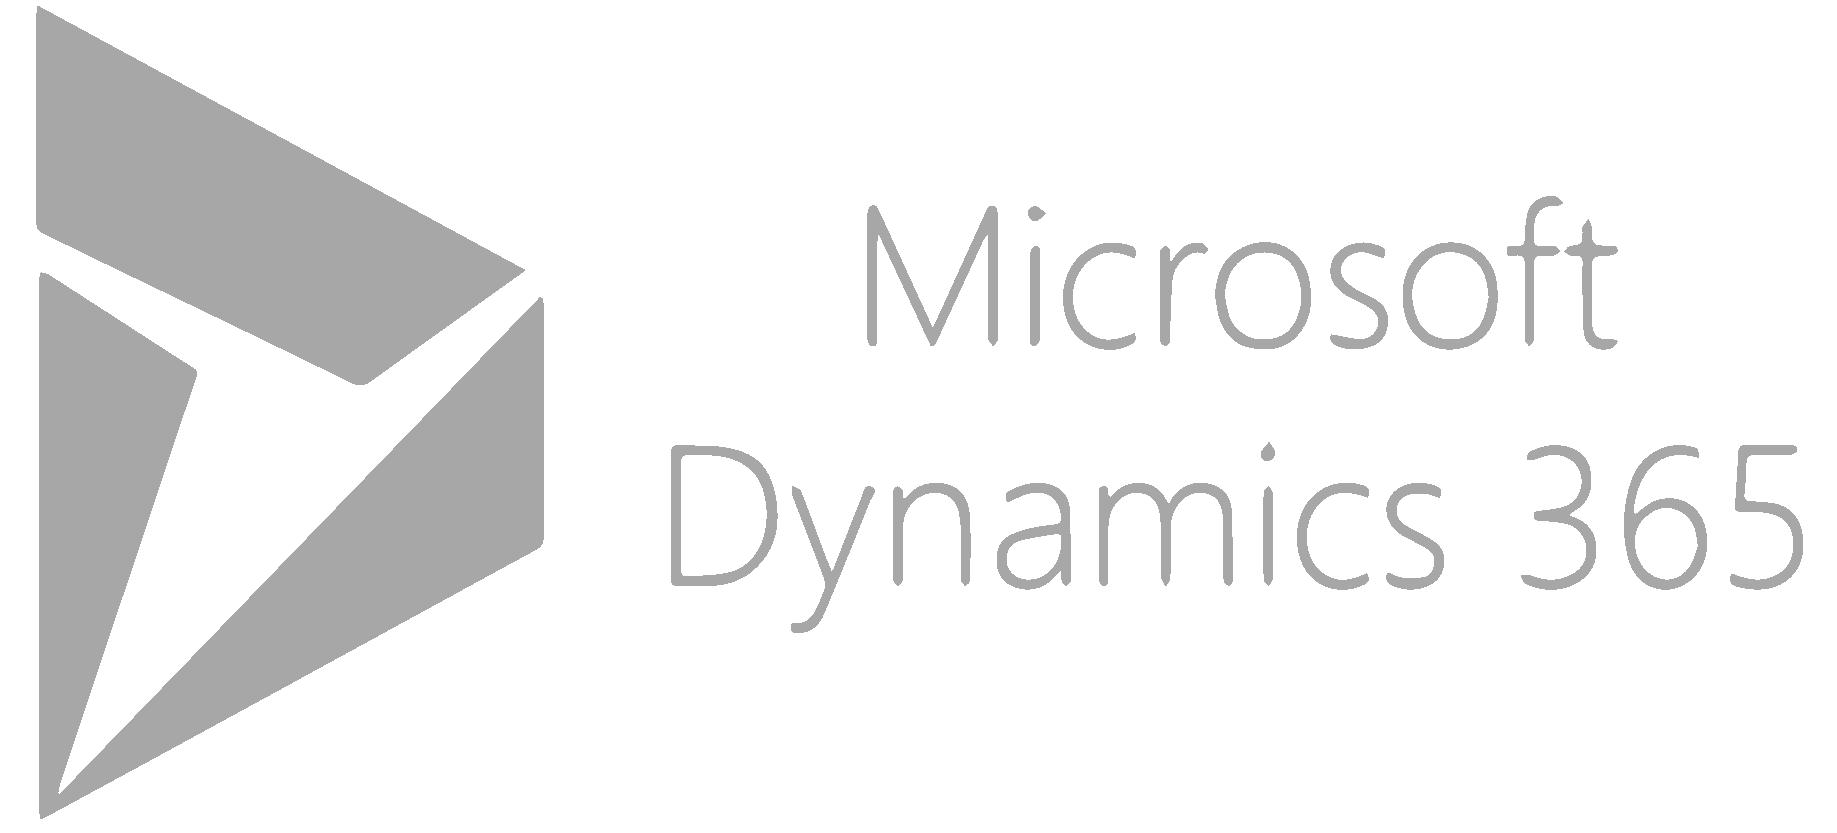 software development Microsoft Dynamics 365